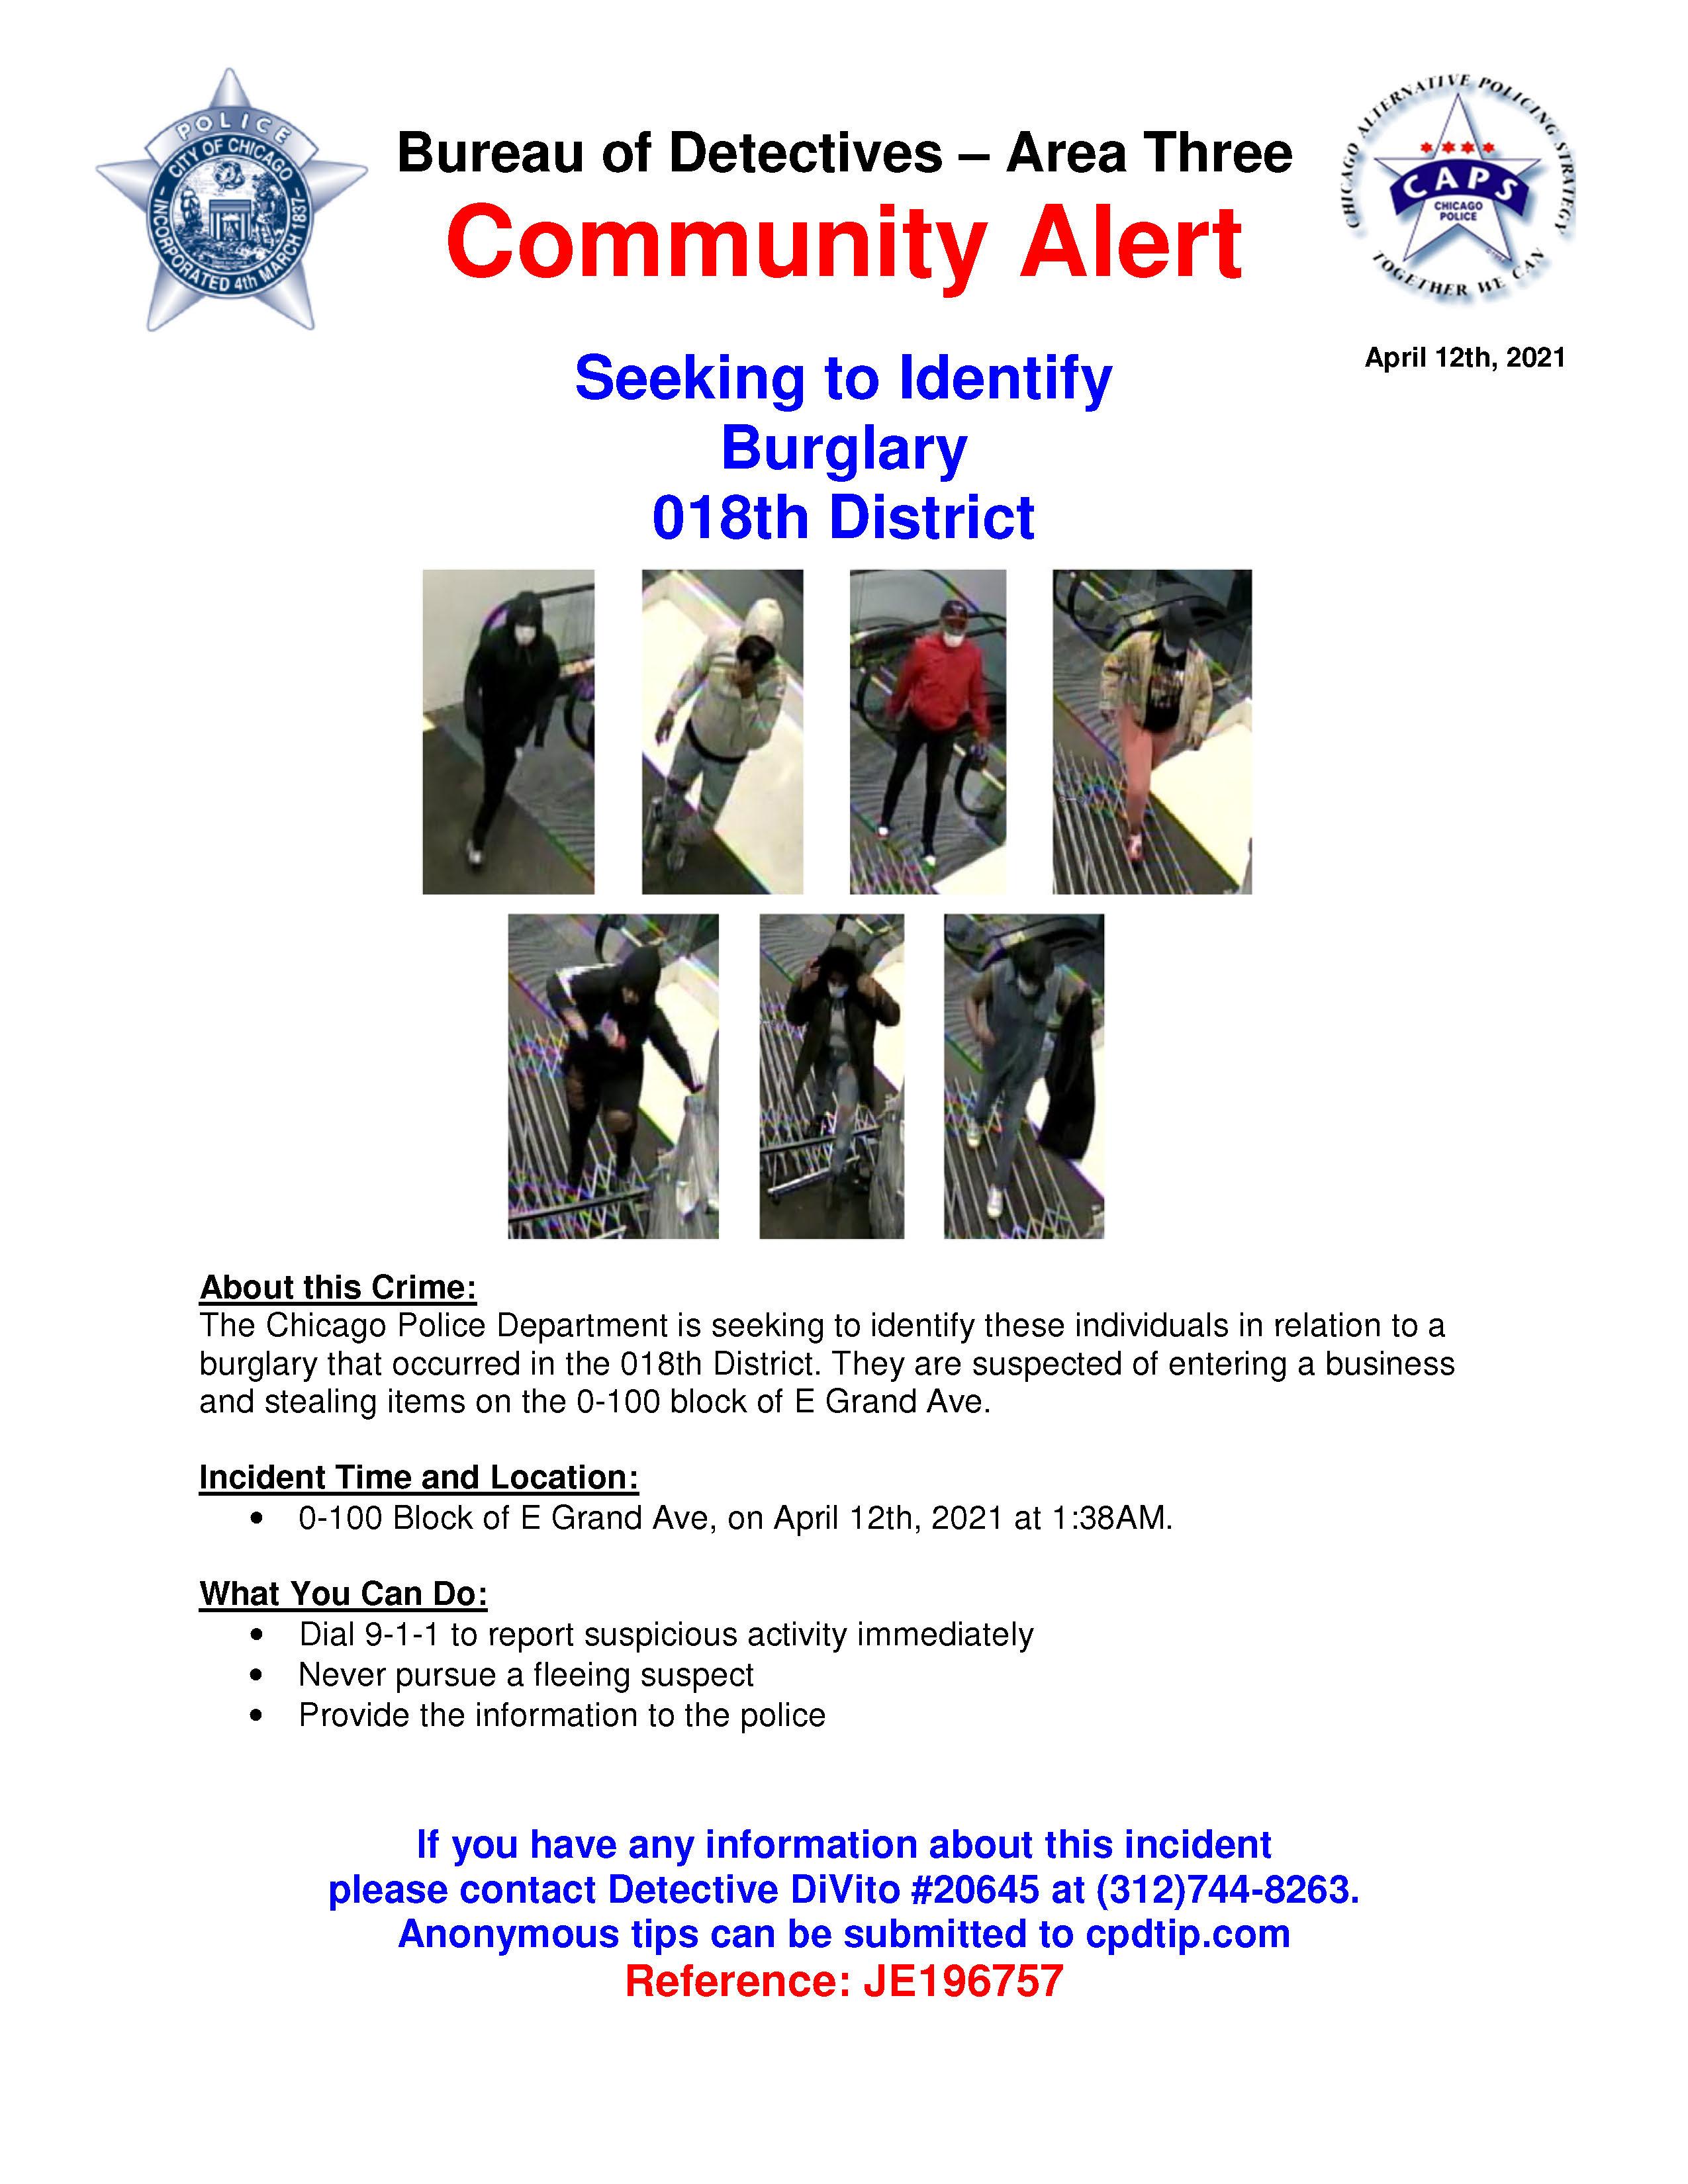 12 Apr 21- Seeking to Identify_Burglary_Nordstrom 12 Apr 21